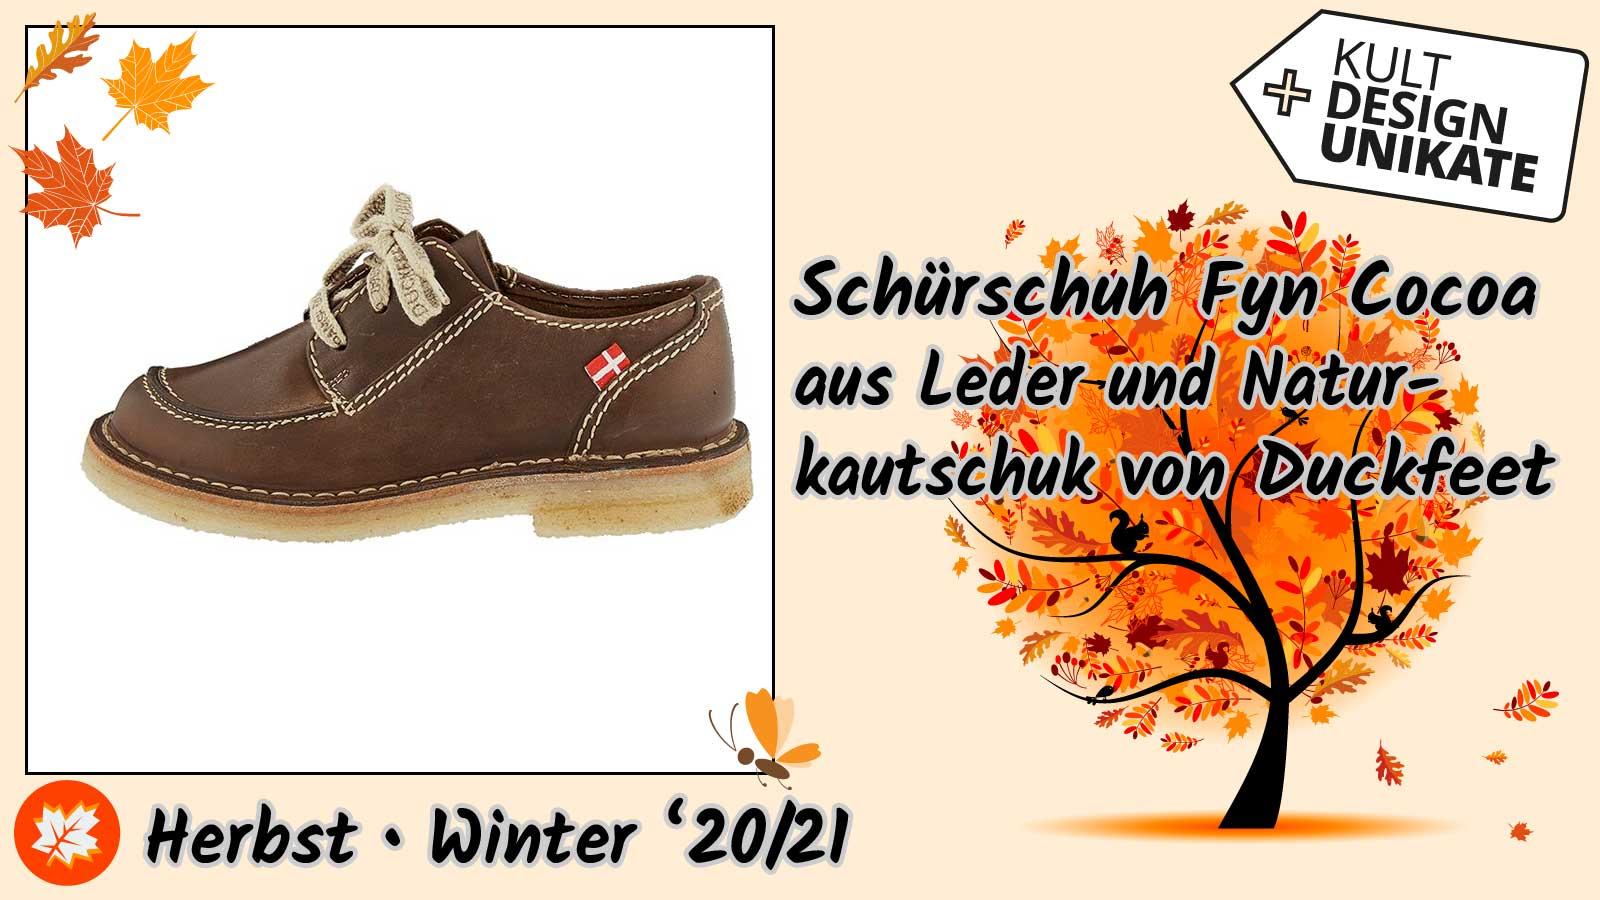 Duckfeet-Schuerschuh-Fyn-Cocoa